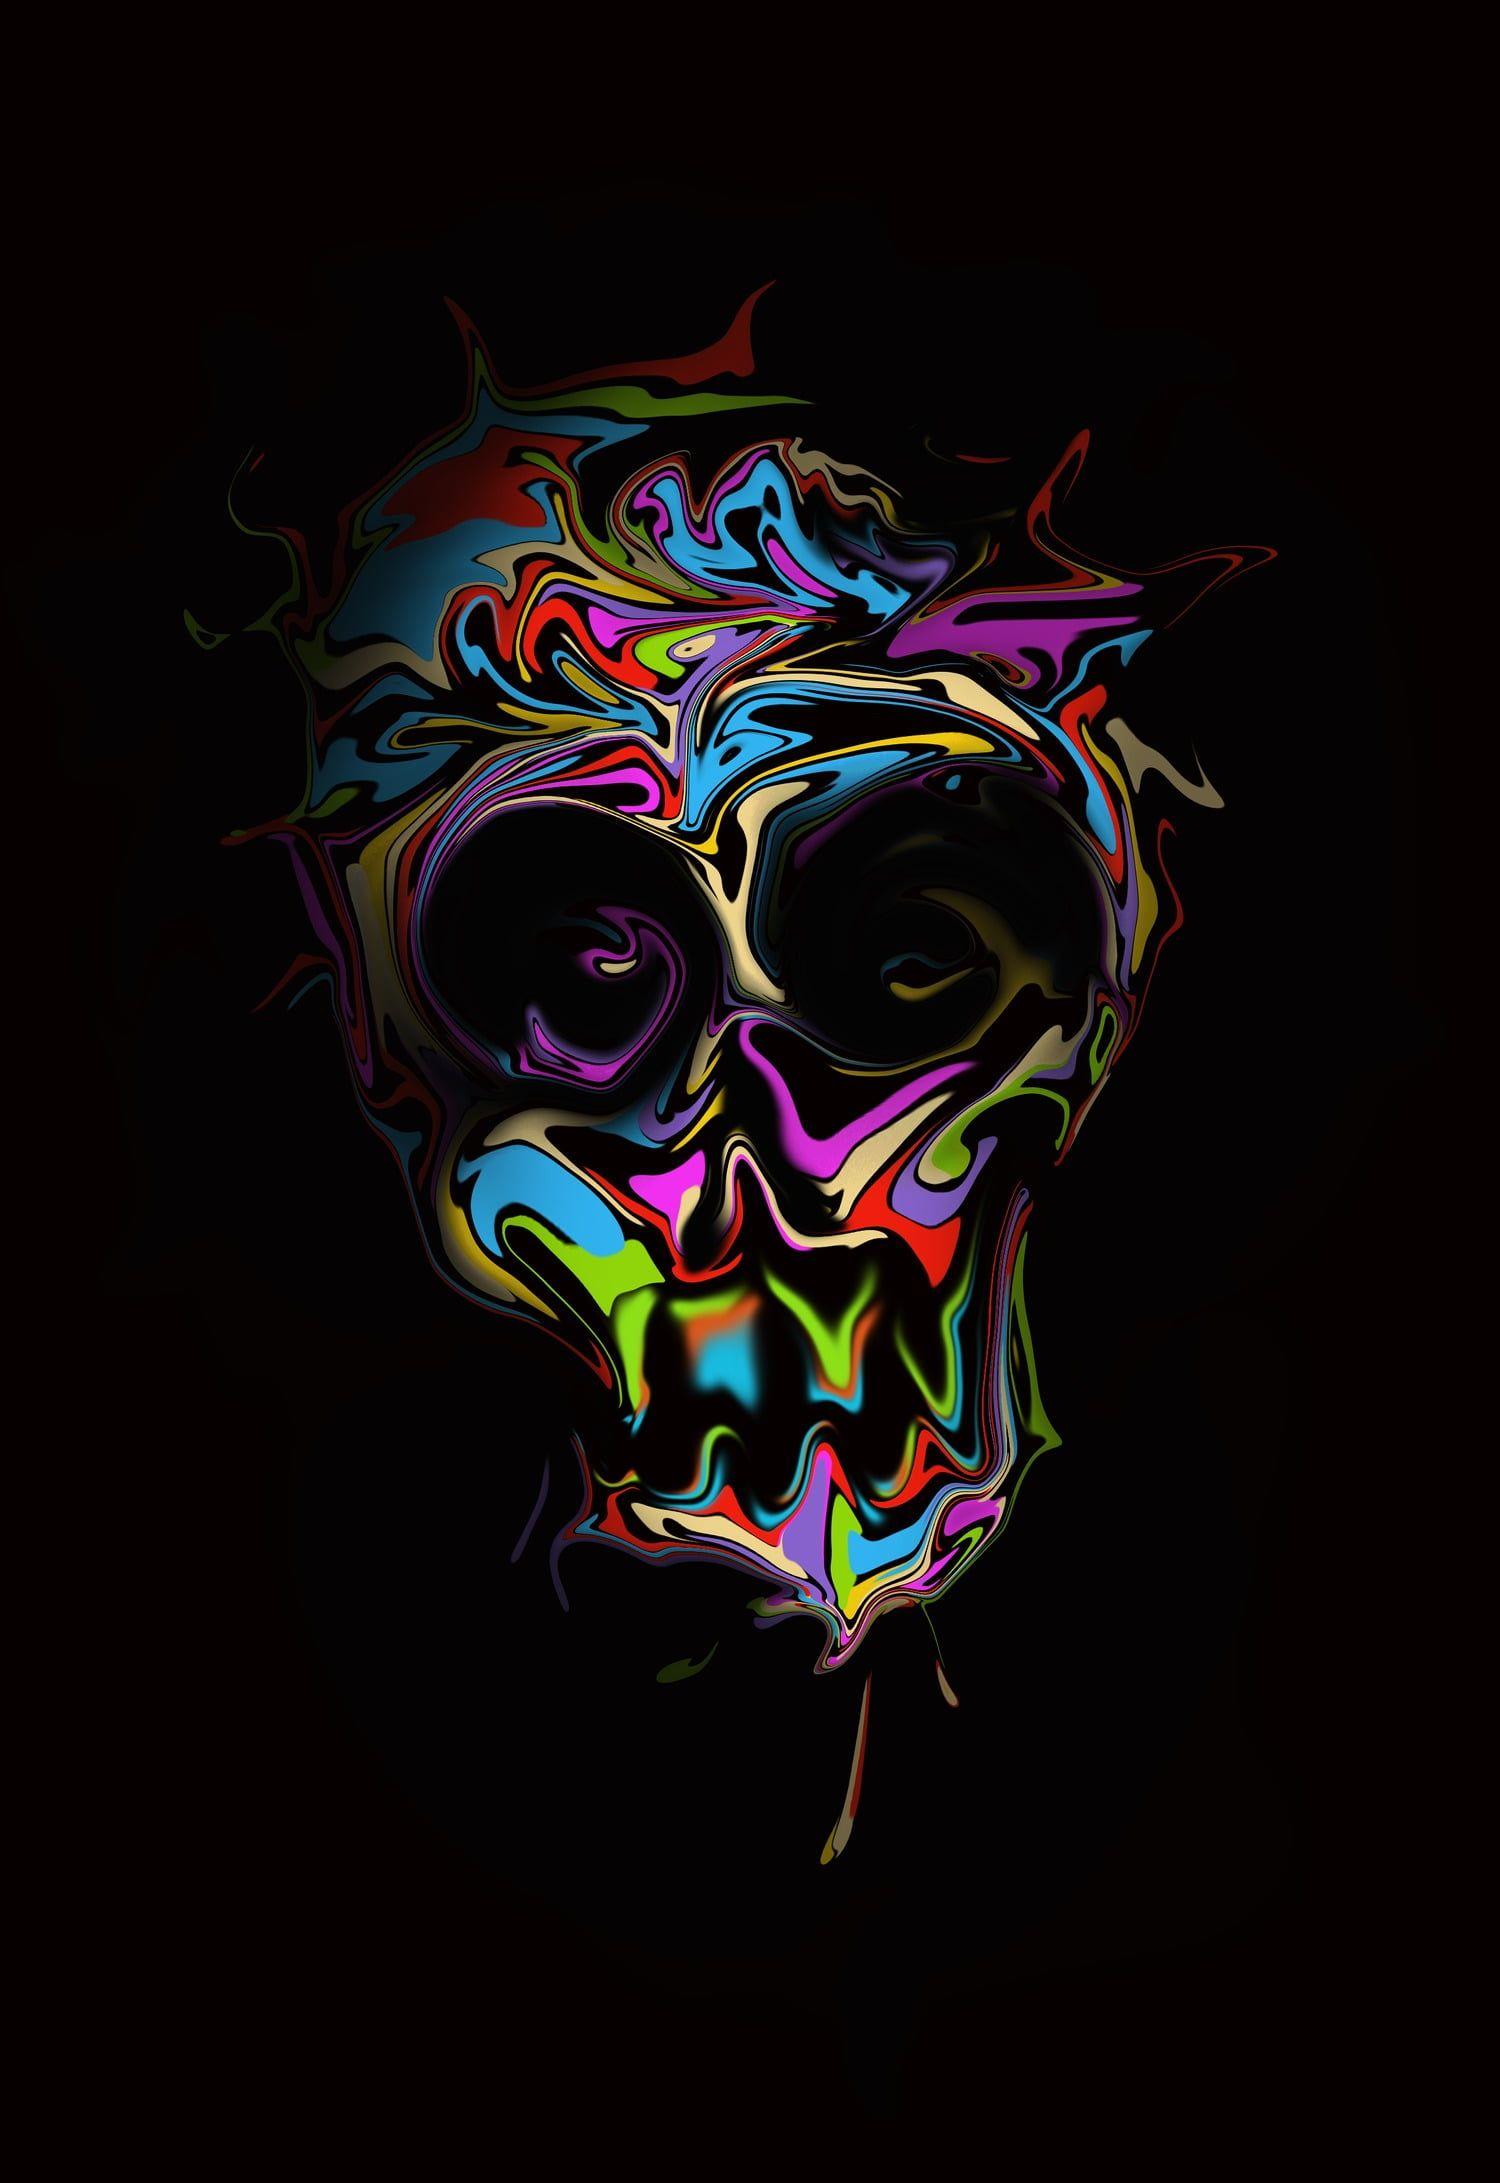 Multicolored Skull Artwork Digital Art Skull Simple Background